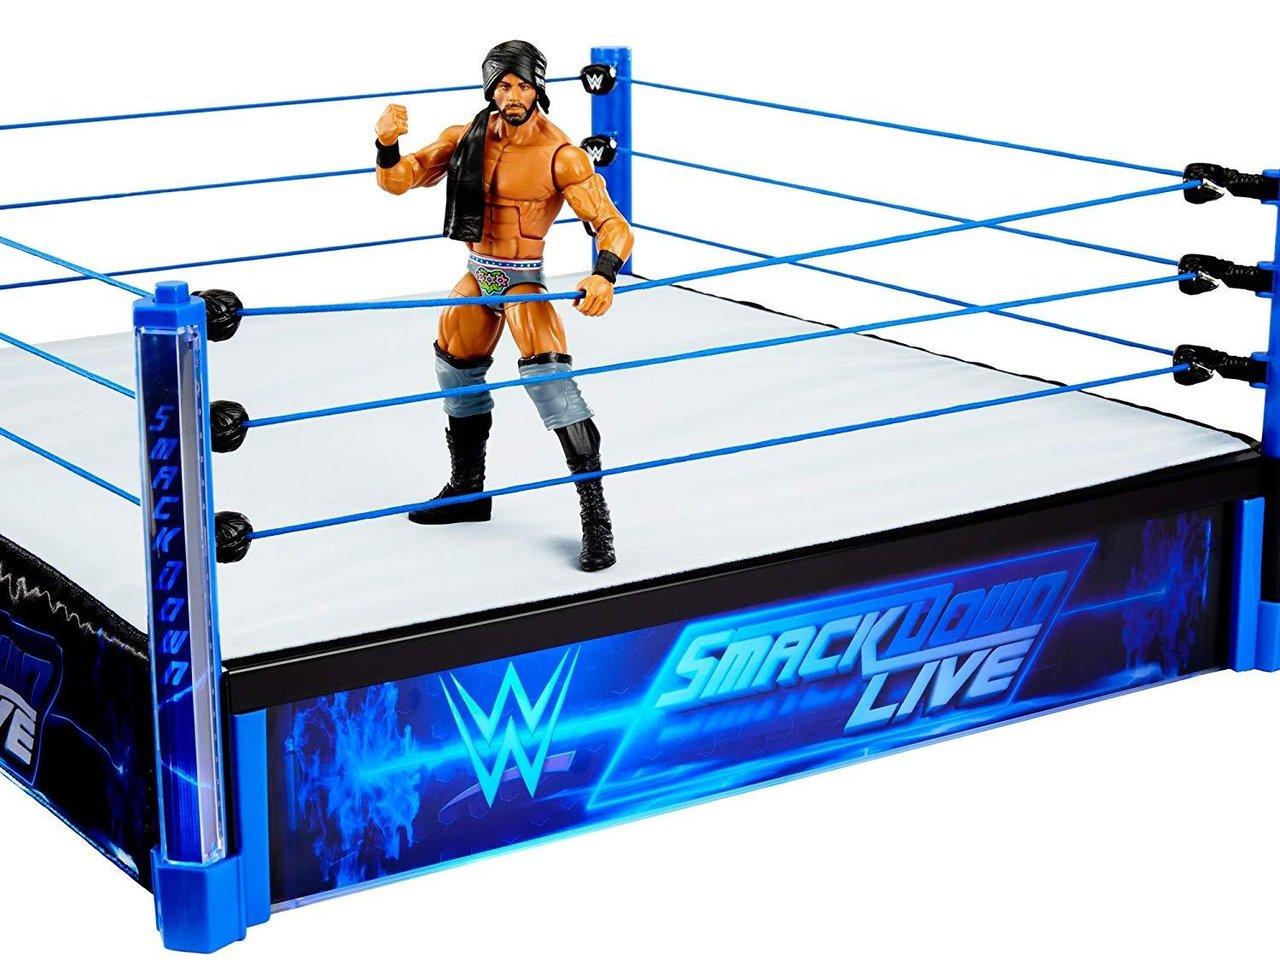 Wwe Smackdown Live Main Event Bague Echelle Elite Jinder Mahal Figur